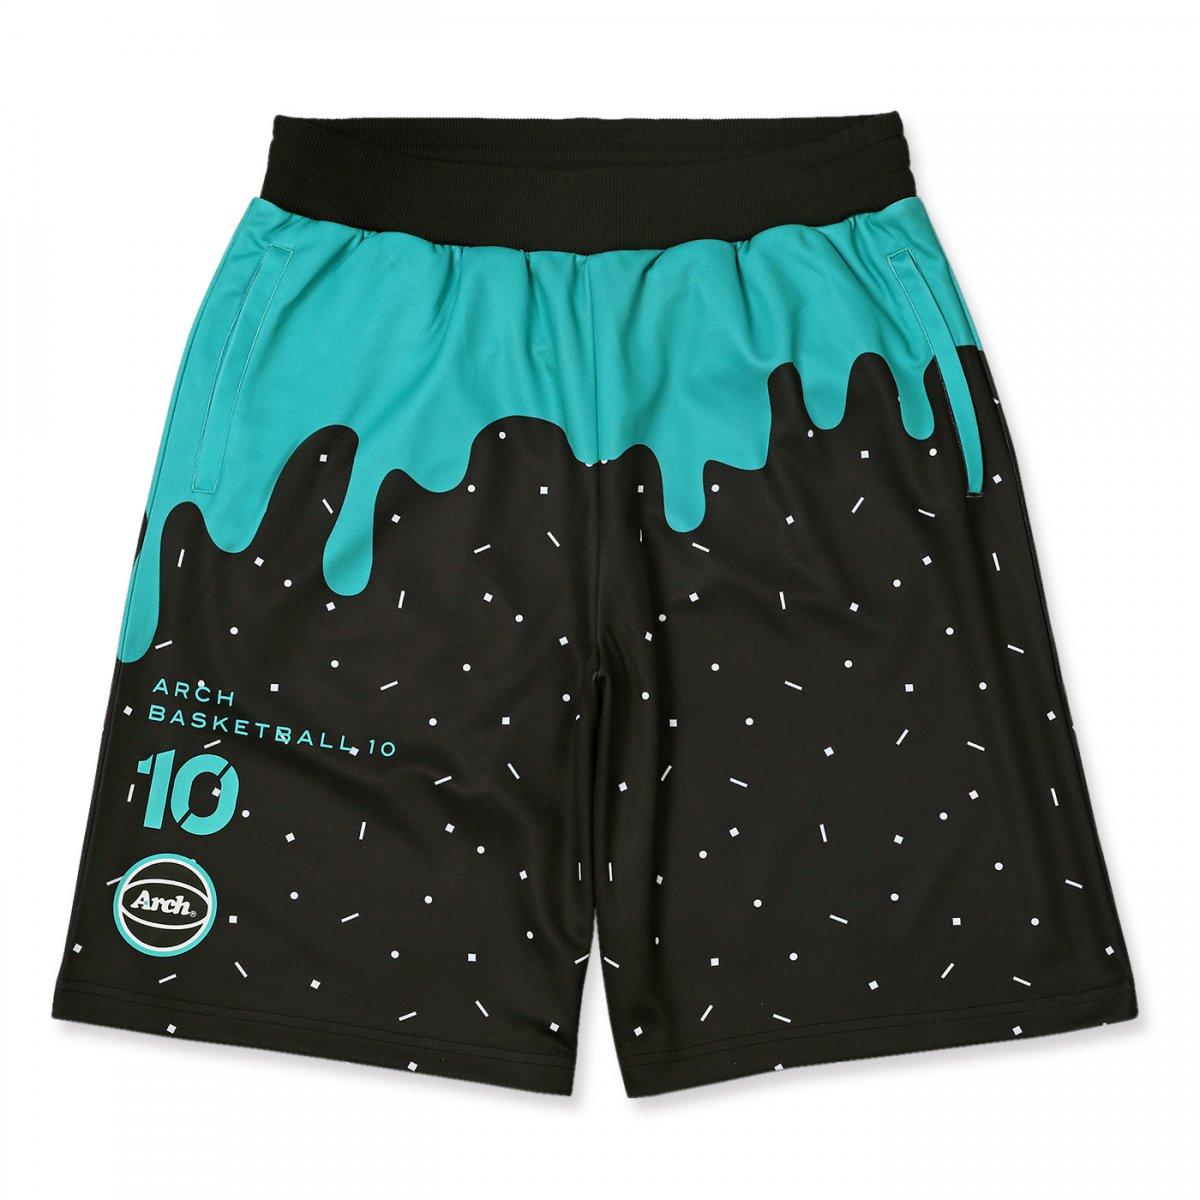 BB10 shorts【black】